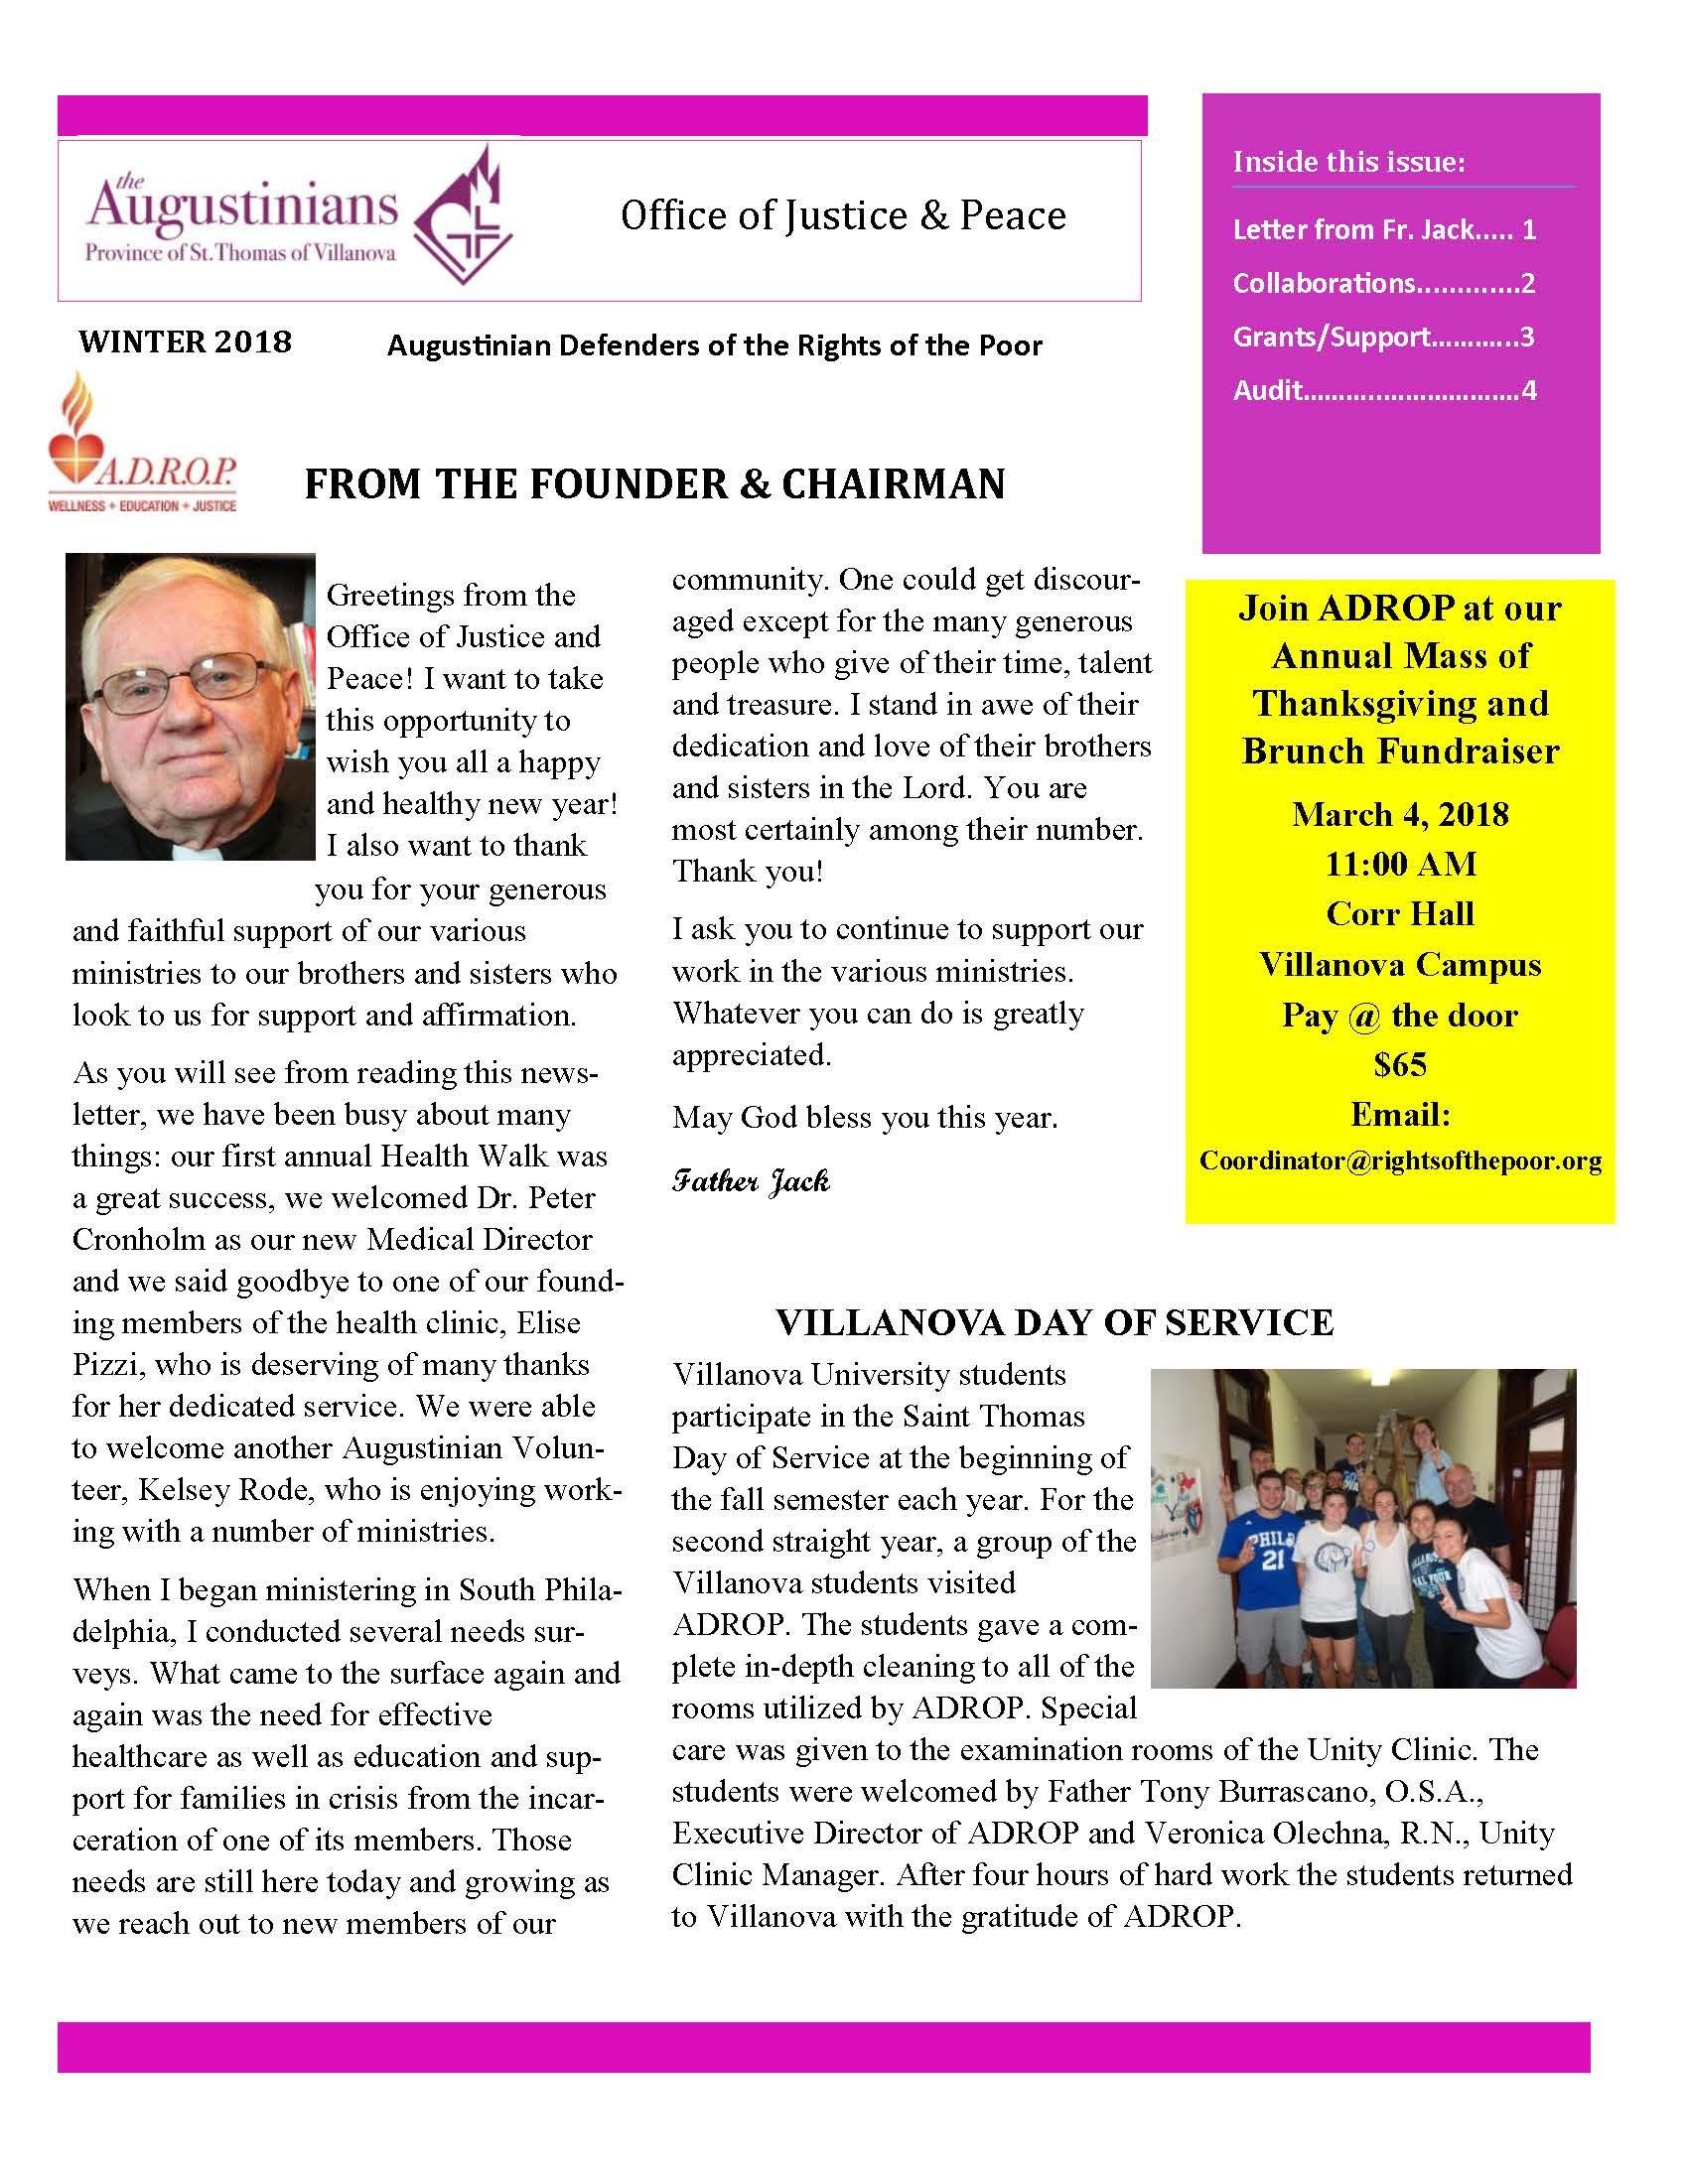 2018-01 Newsletter_Page_1.jpg